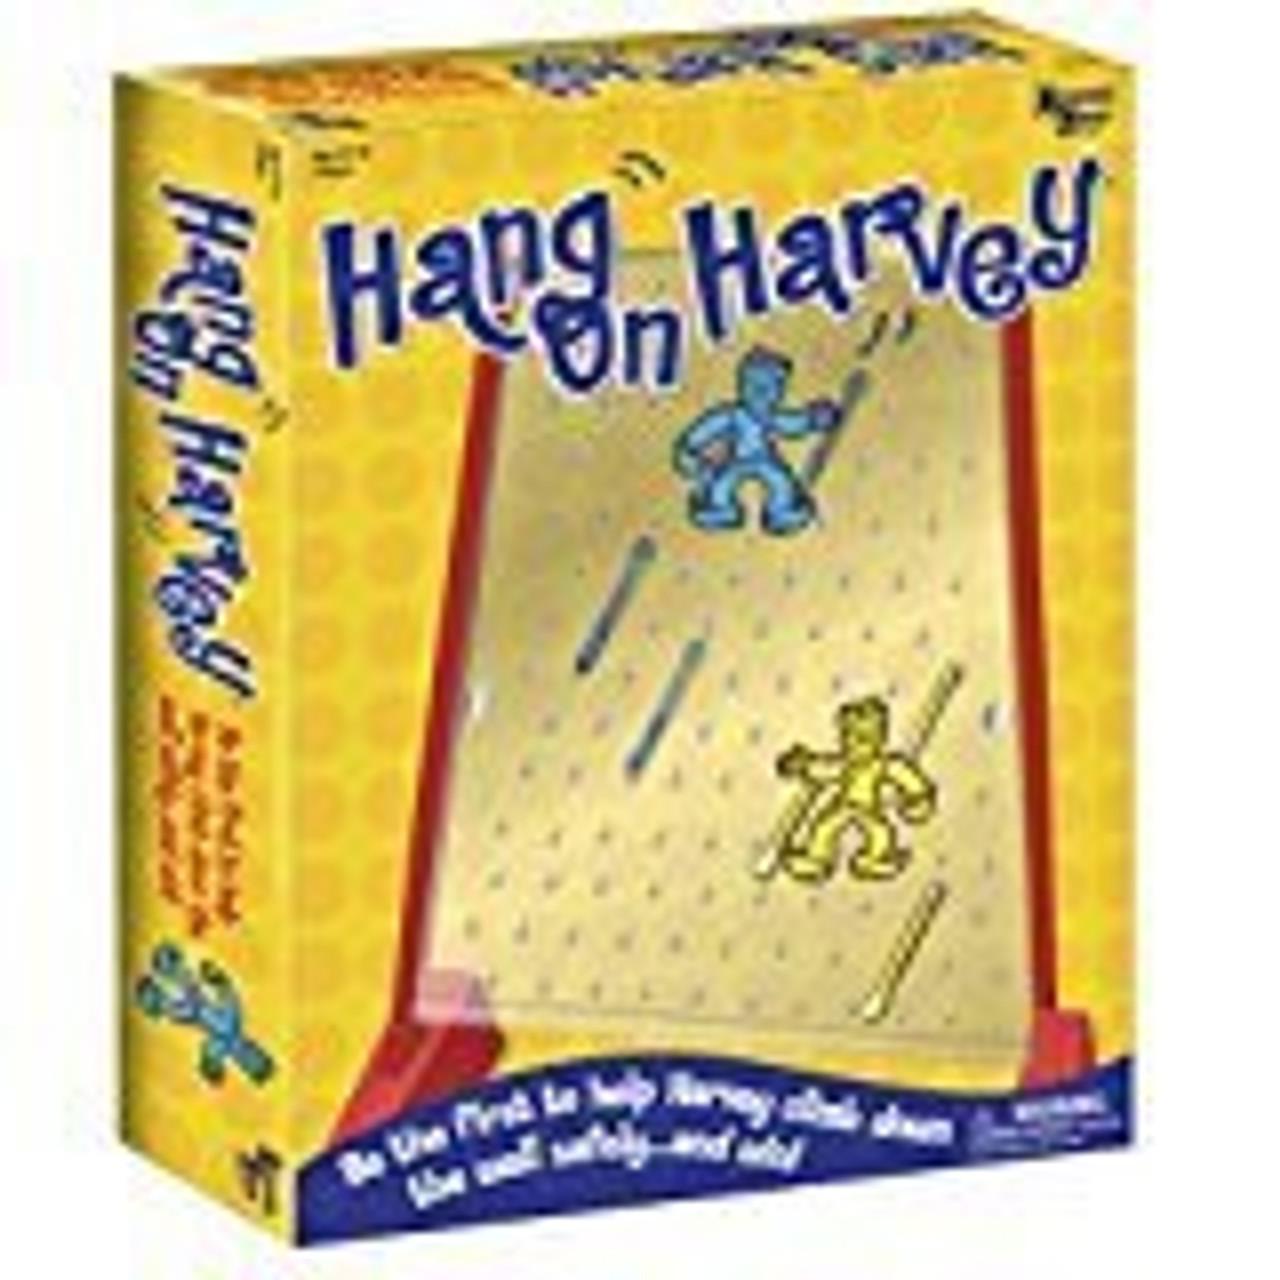 HANG ON HARVEY